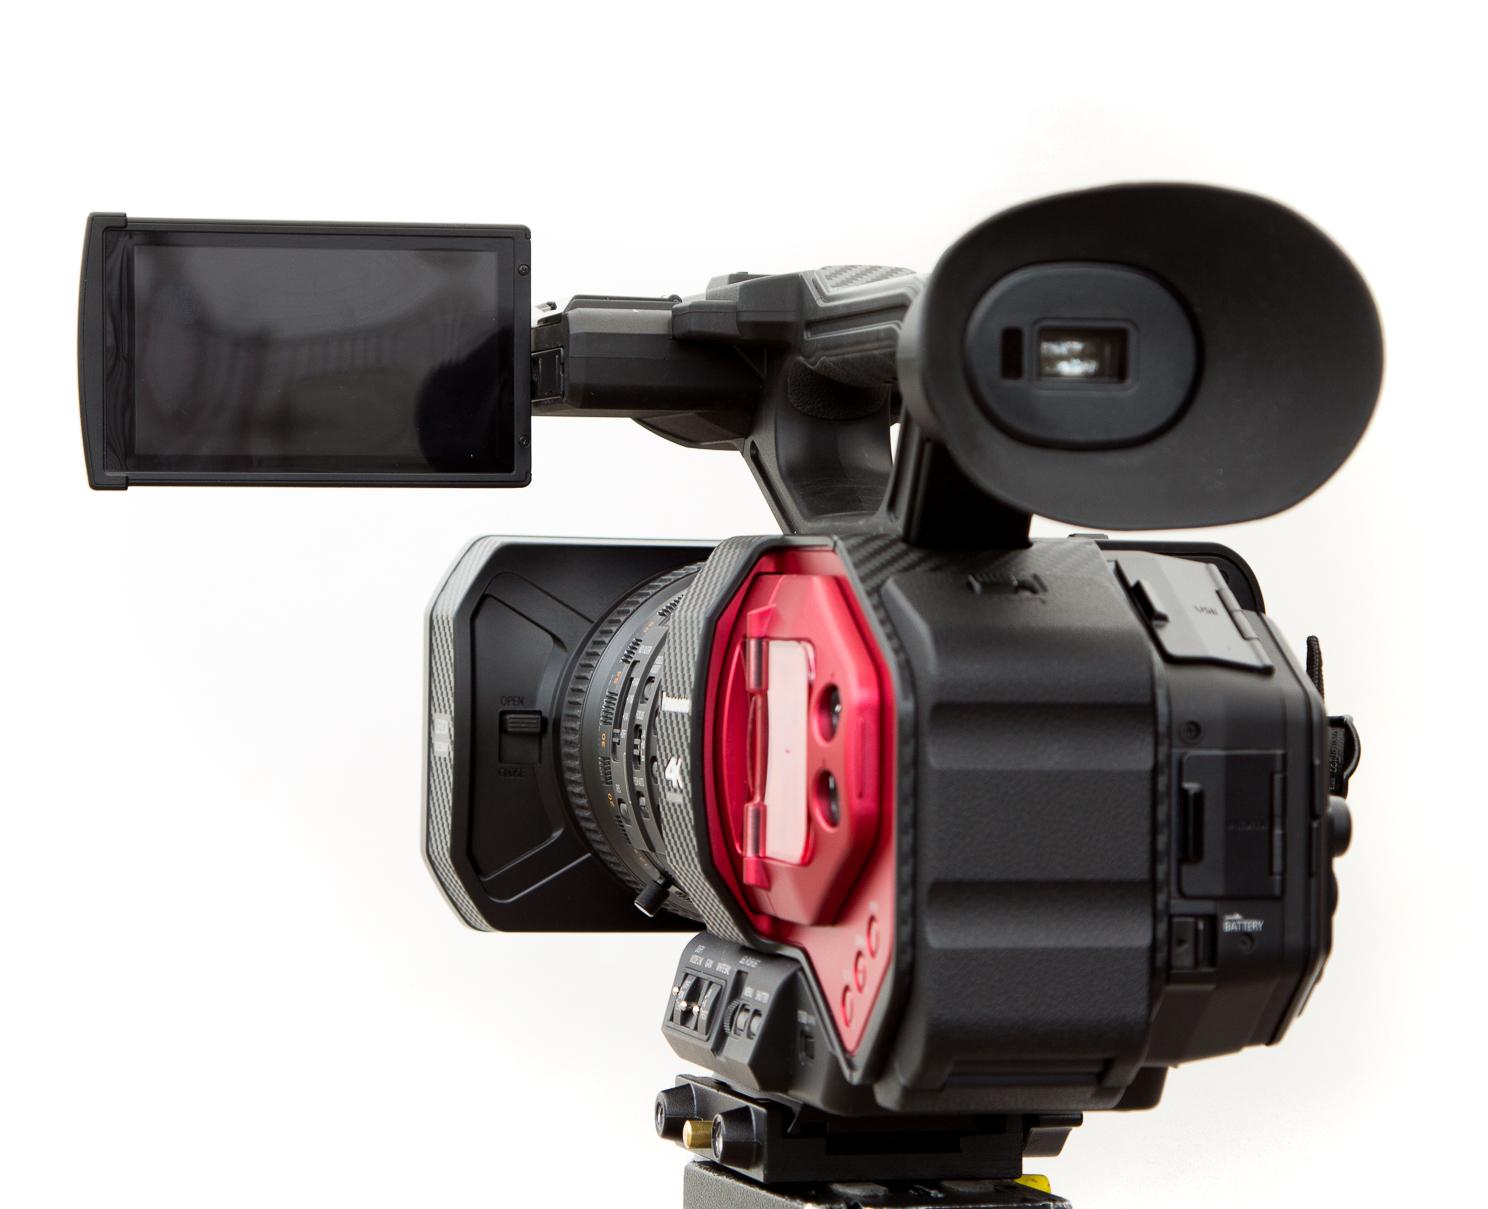 Panasonic's 4K DVX-200 camera review